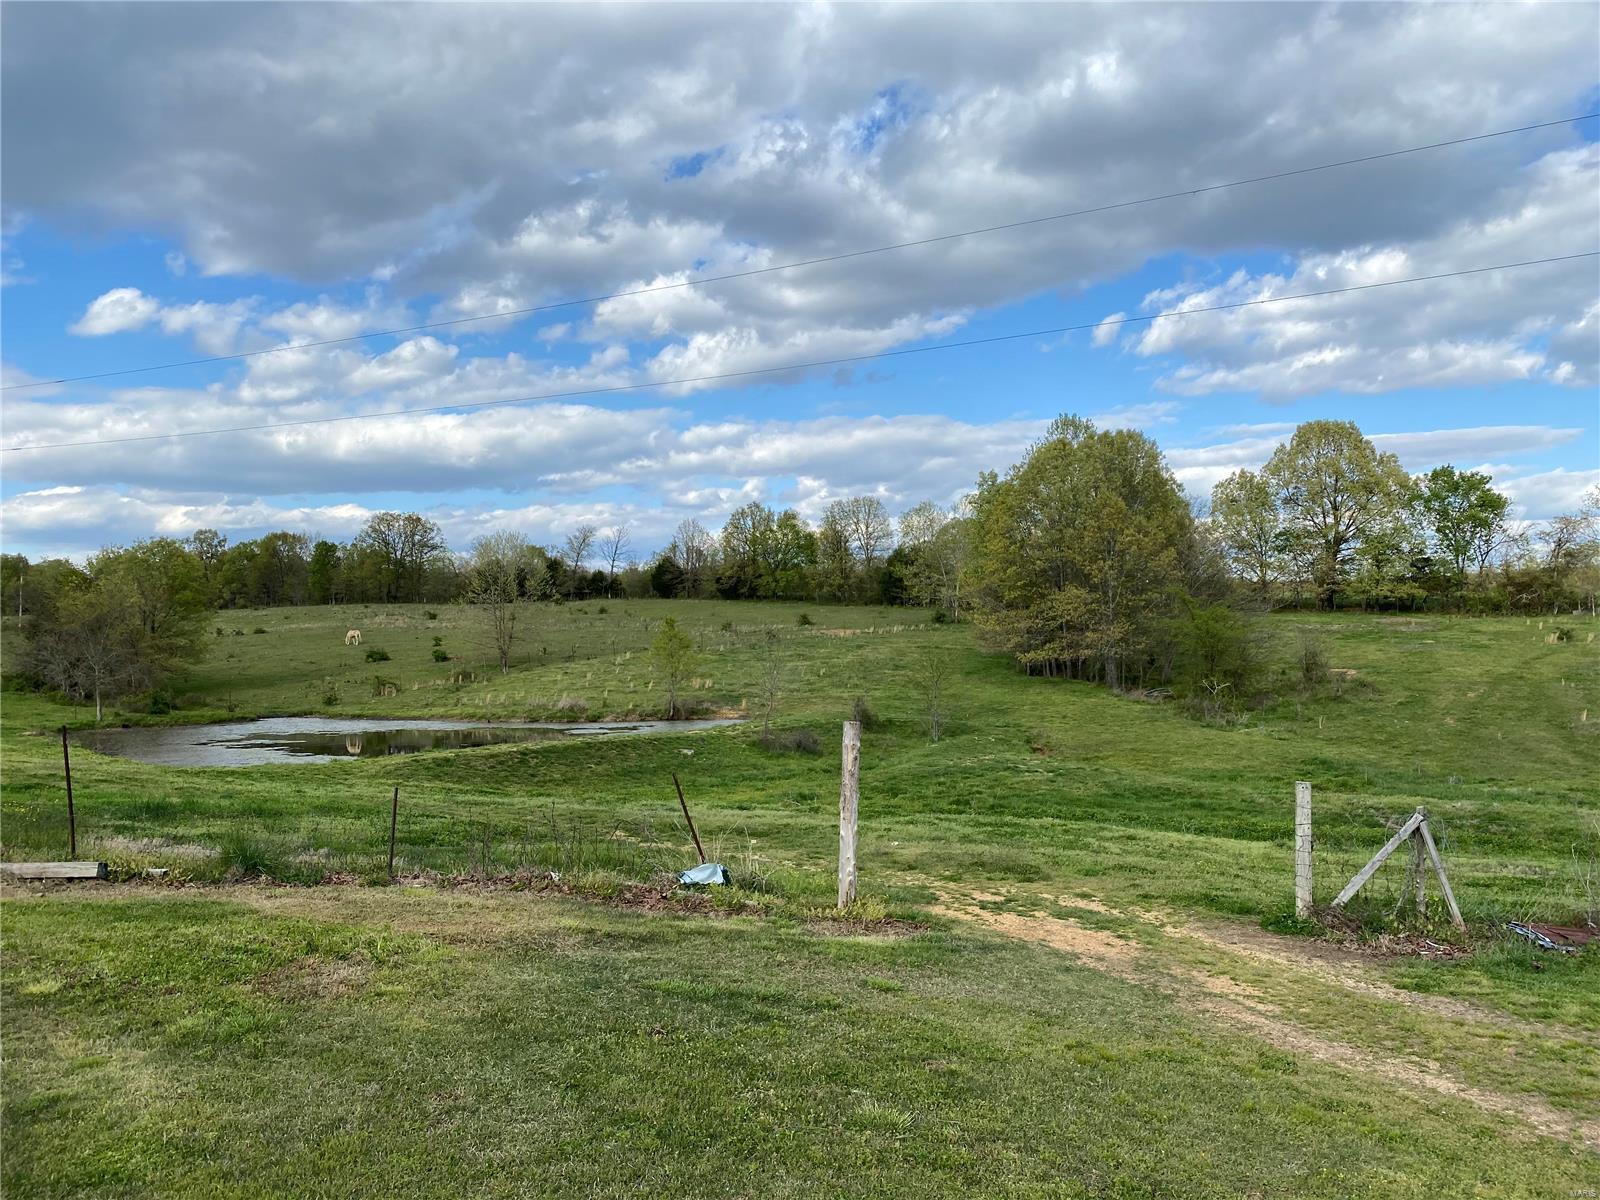 598 Ripley Z5, Z6 Property Photo - Gatewood, MO real estate listing